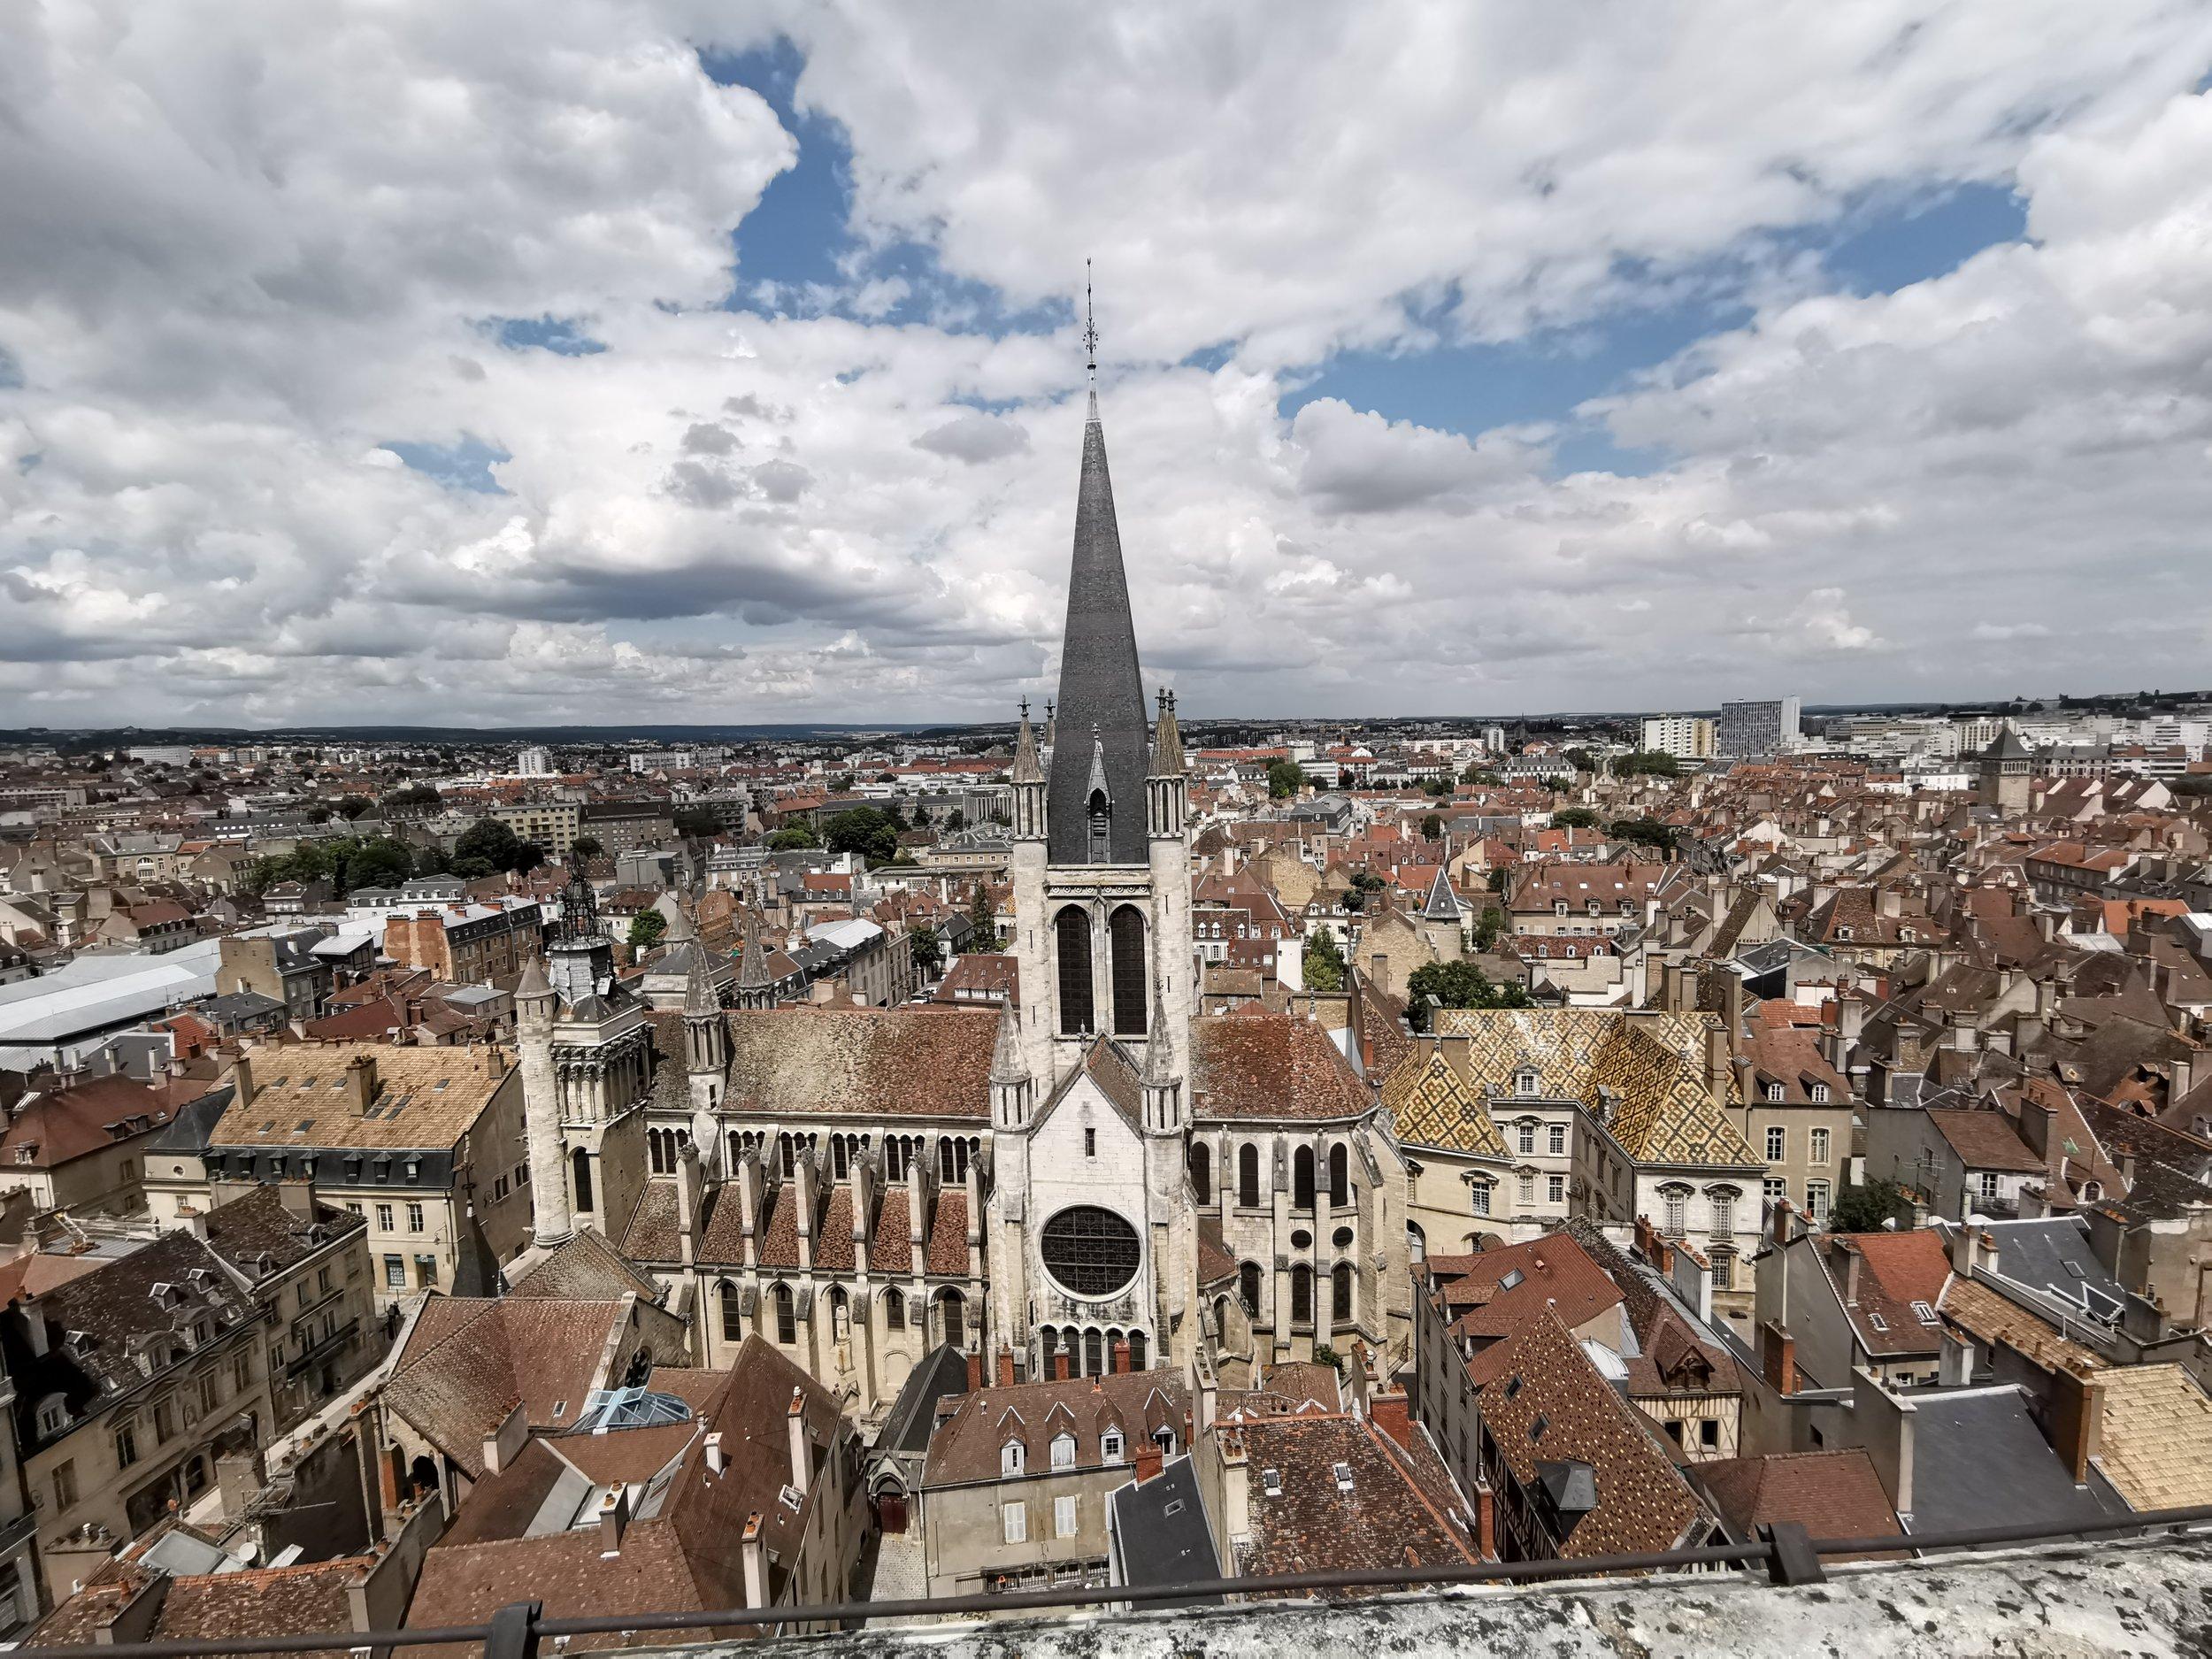 Dijon viewpoint